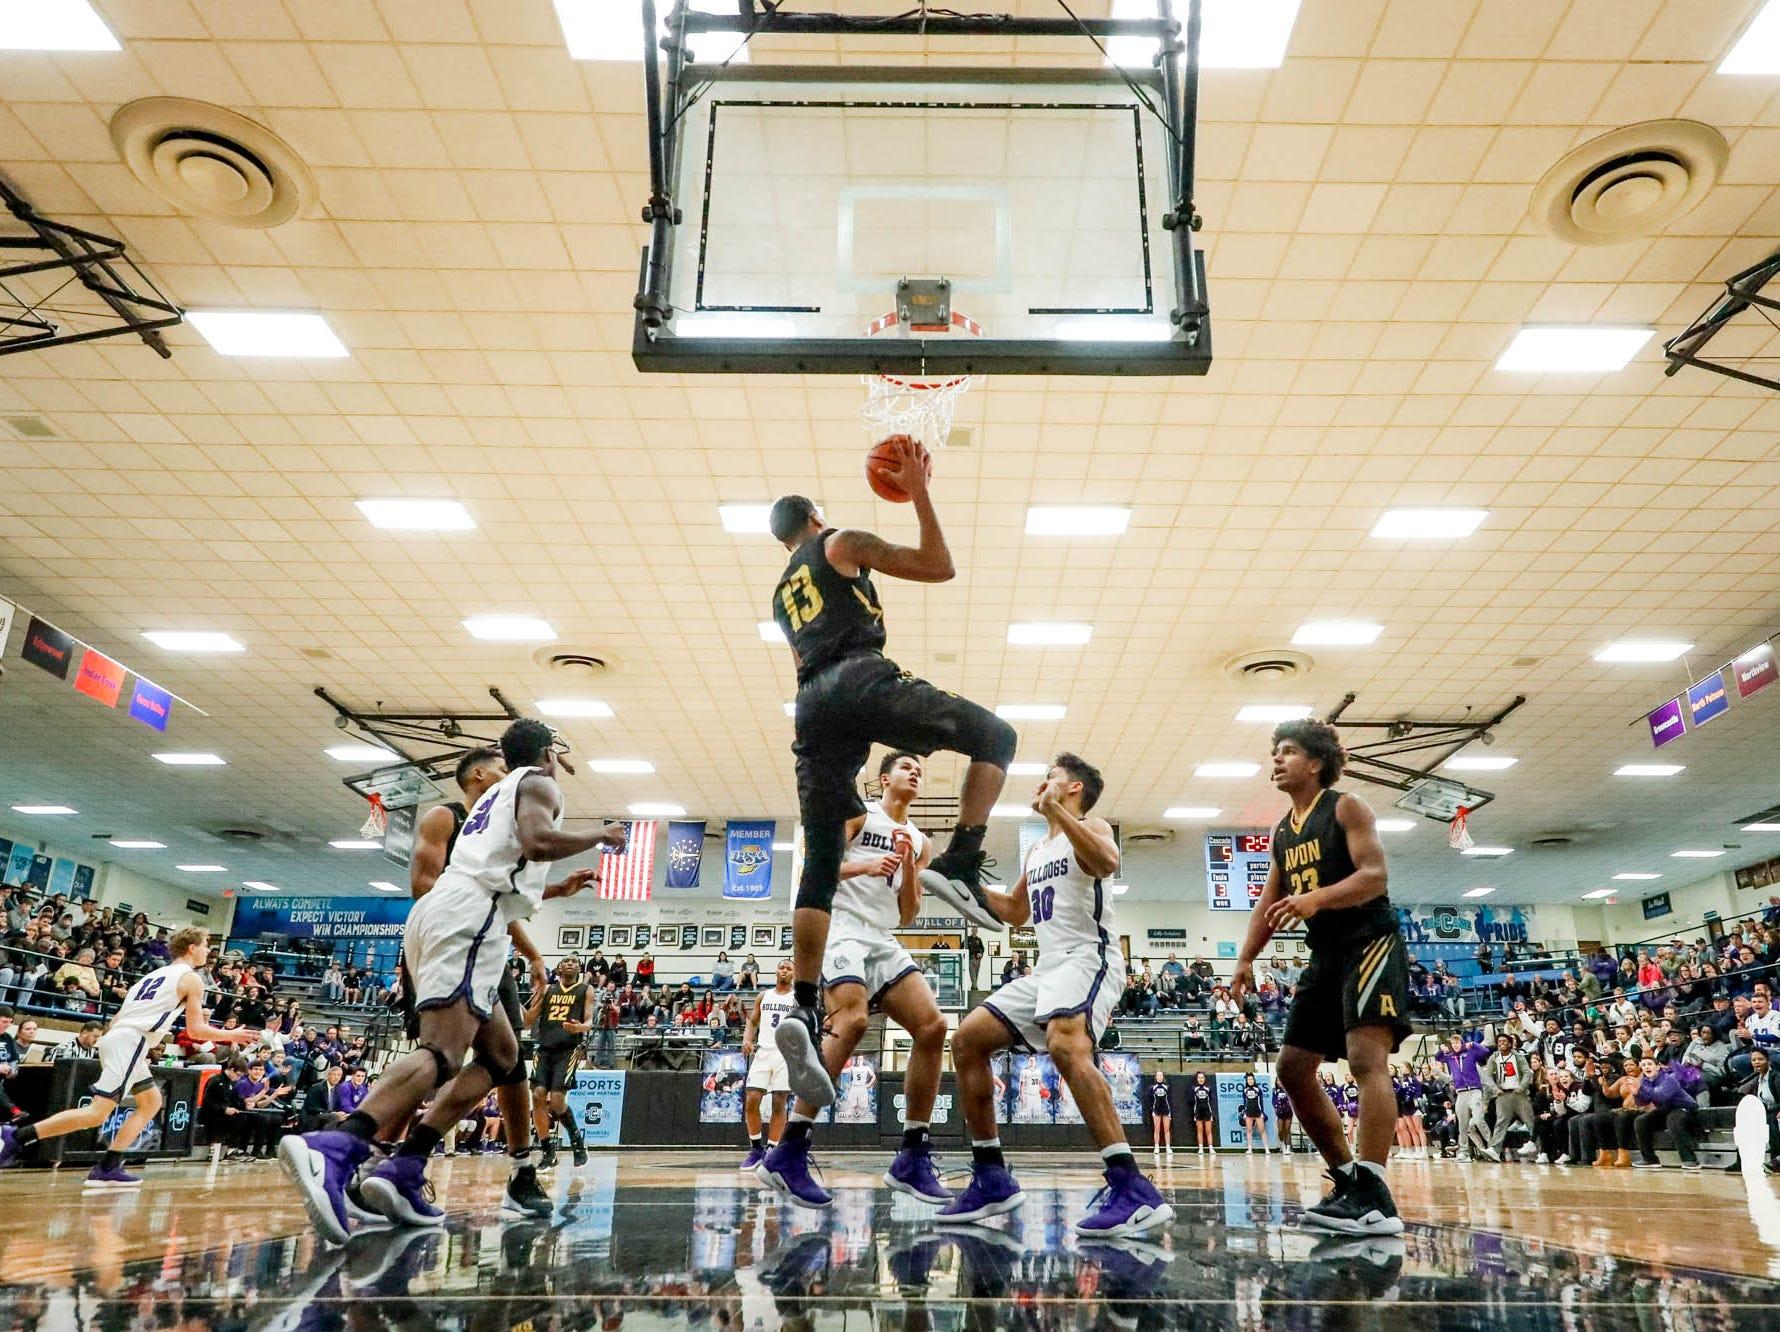 Avon High School's Jayden Baylor (13), snatches a rebound during the 2019 Hendricks County Basketball Tournament game between the Avon High School boys varsity basketball team and Brownsburg High School, held at Cascade High School on Saturday, Jan. 5, 2019.